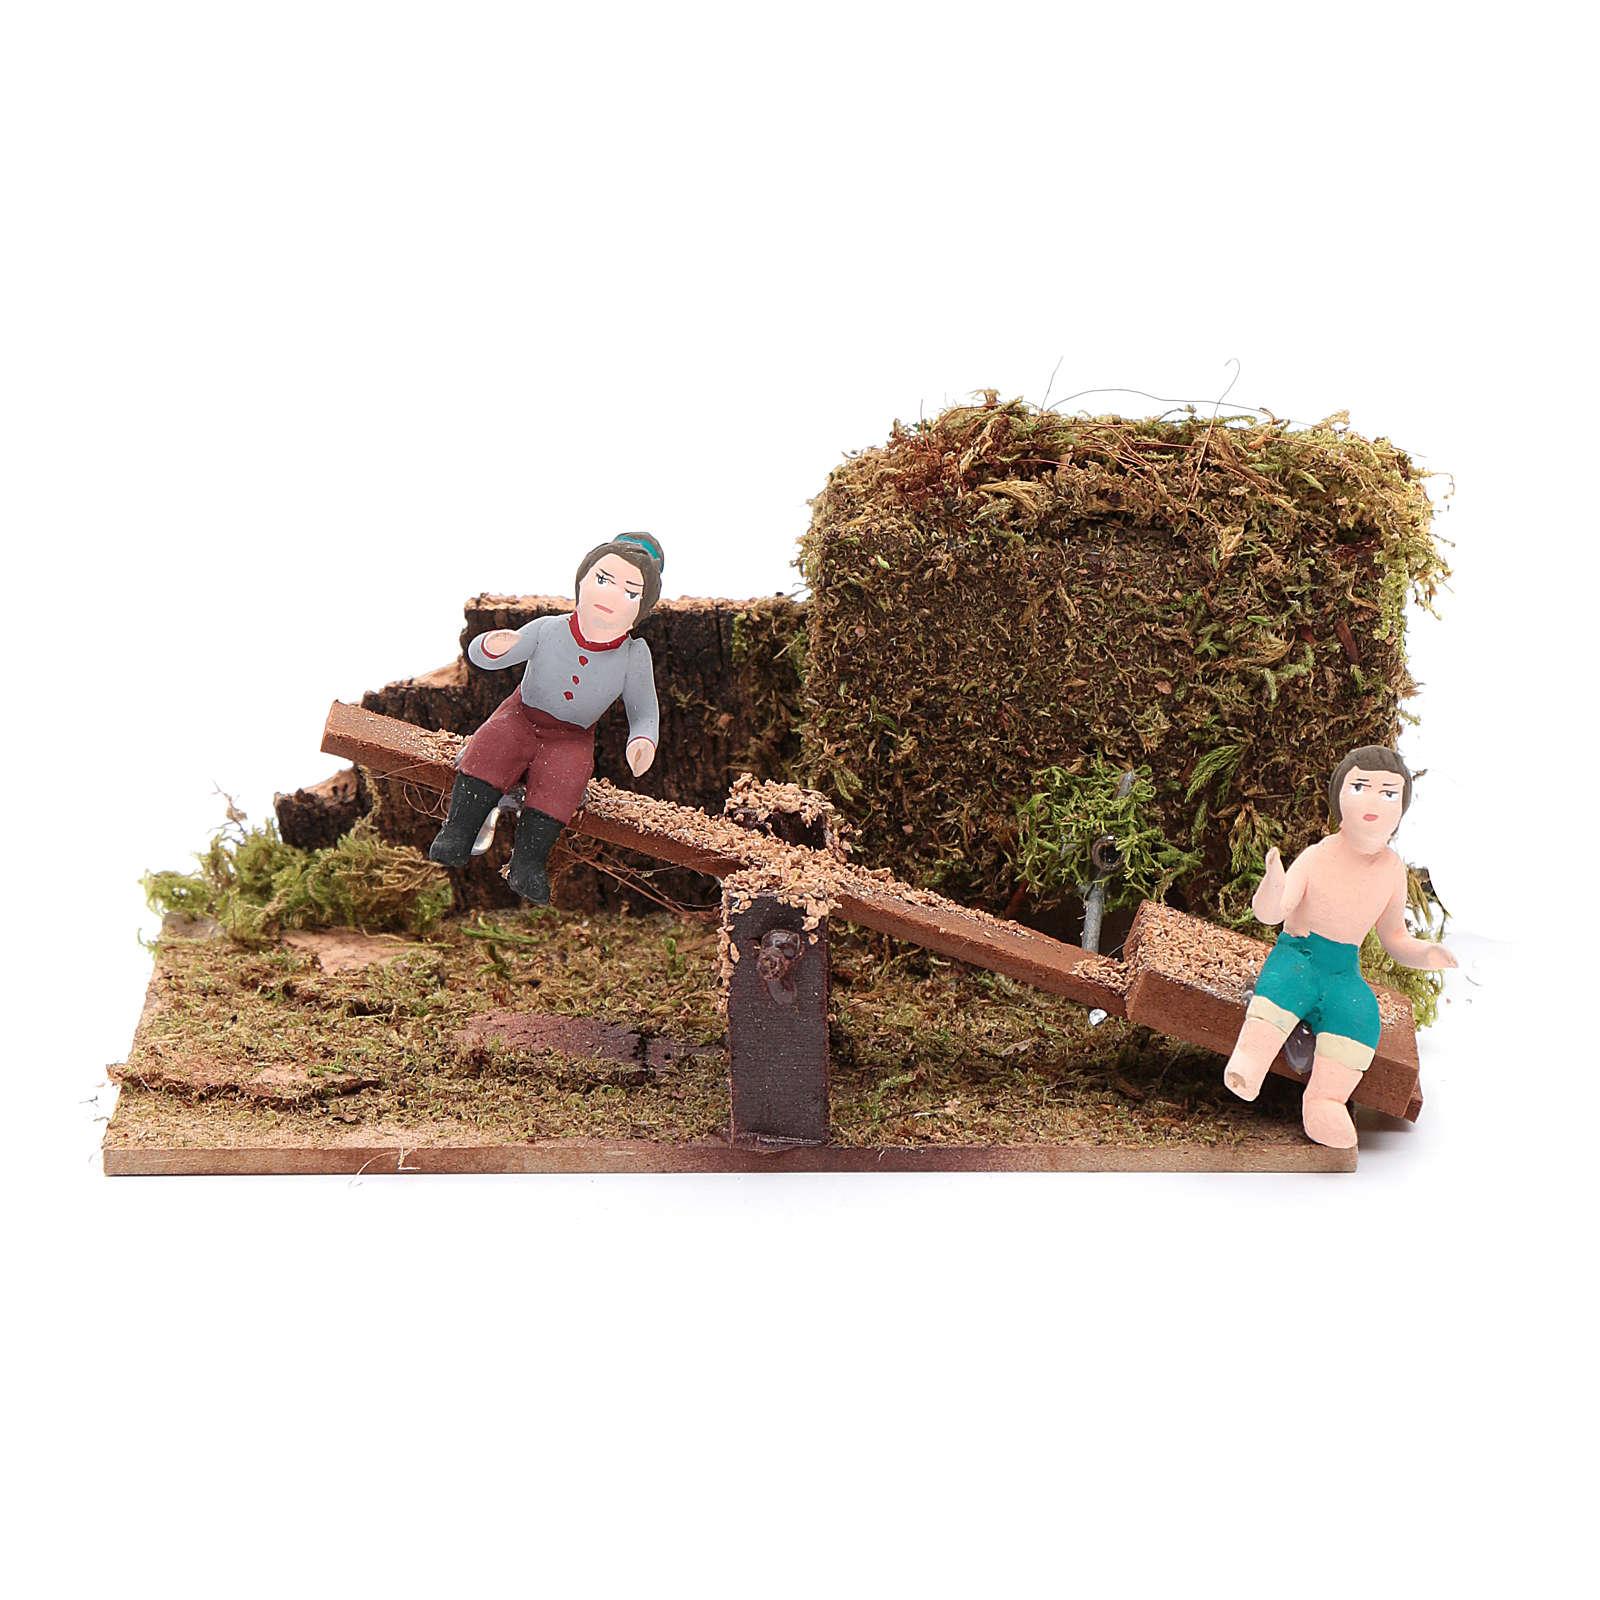 Neapolitan nativity scene moving children on rocking horse 8 cm 4